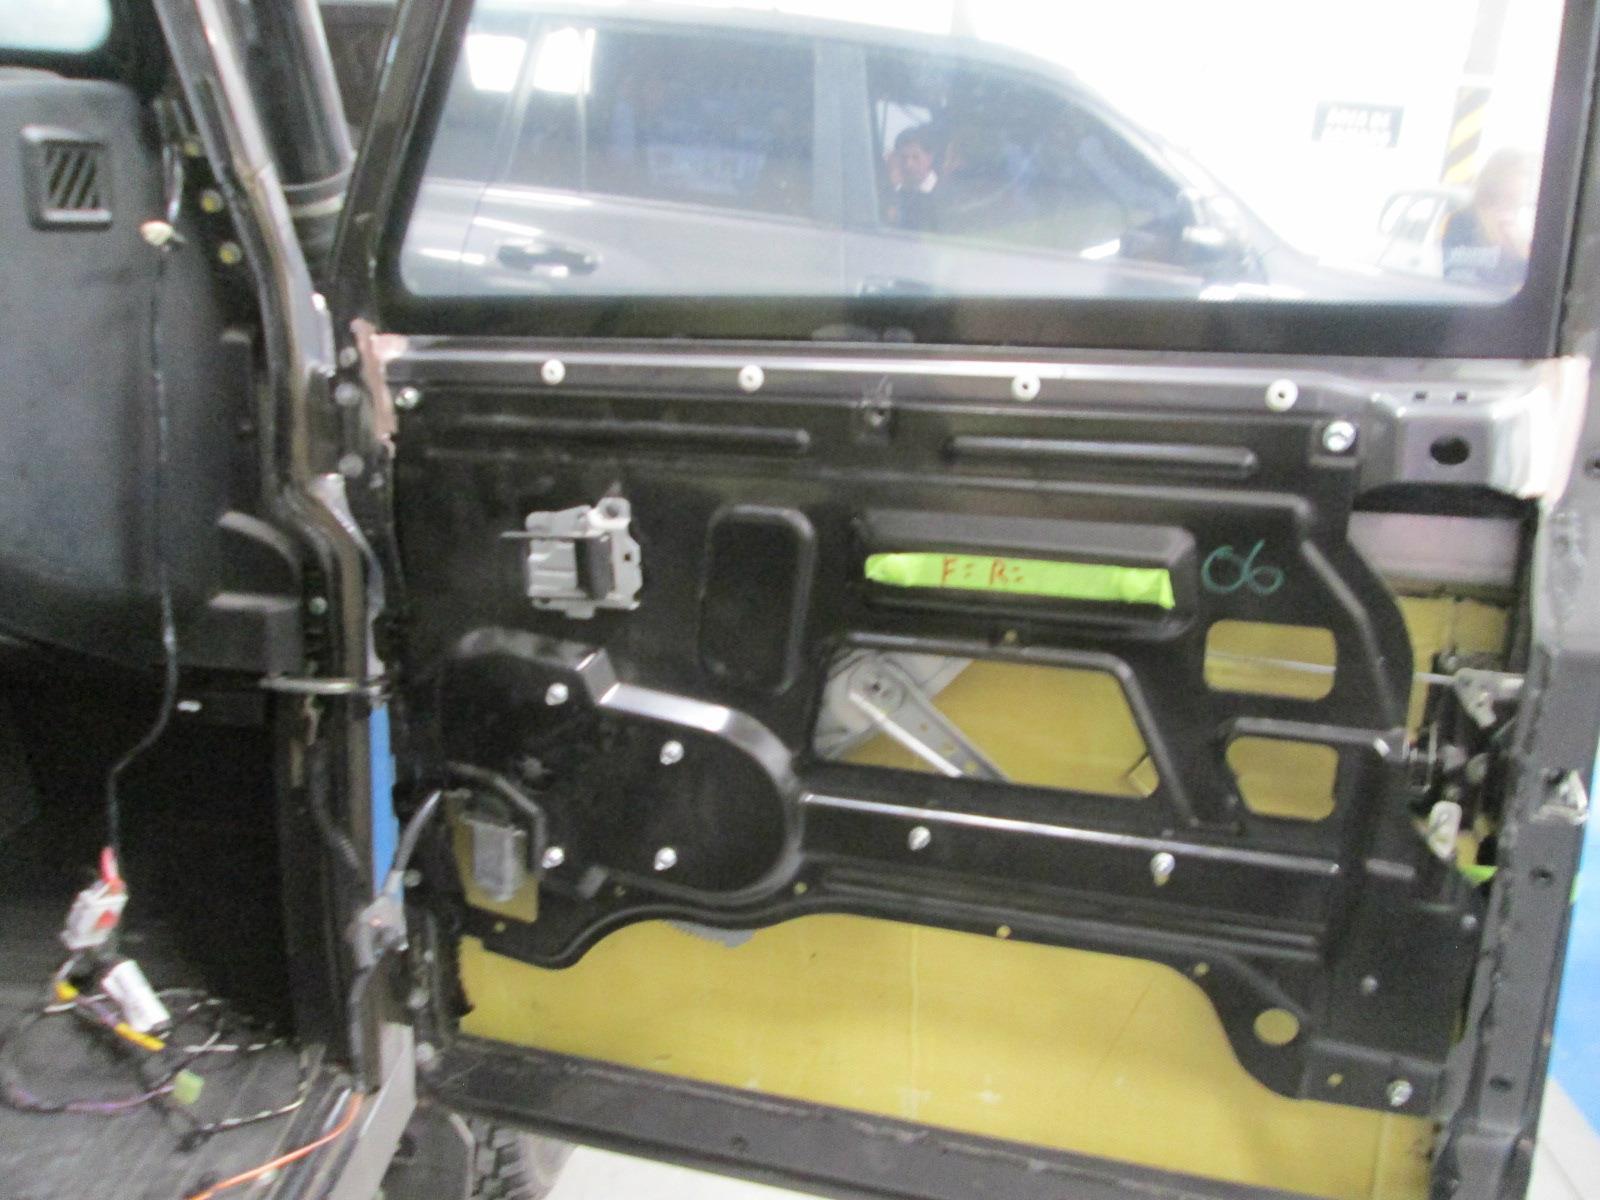 blindajes protec car ltda y jaguar land rover se unen para darle un carro m s seguro a sus. Black Bedroom Furniture Sets. Home Design Ideas